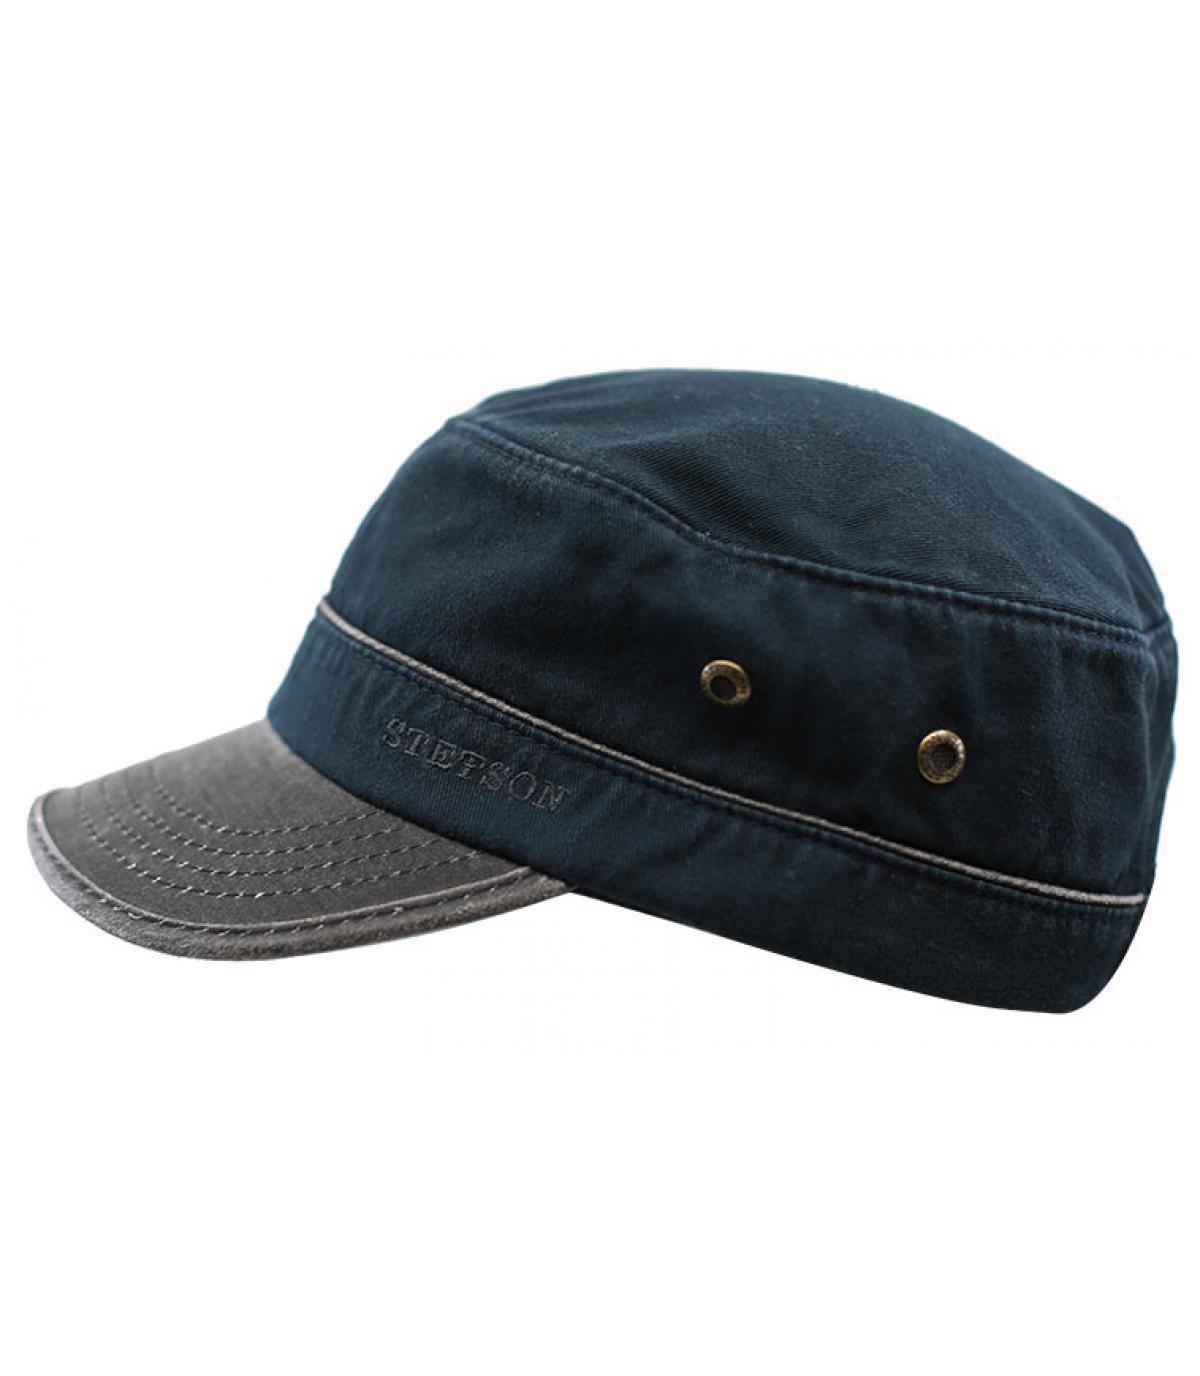 navy blue army cap